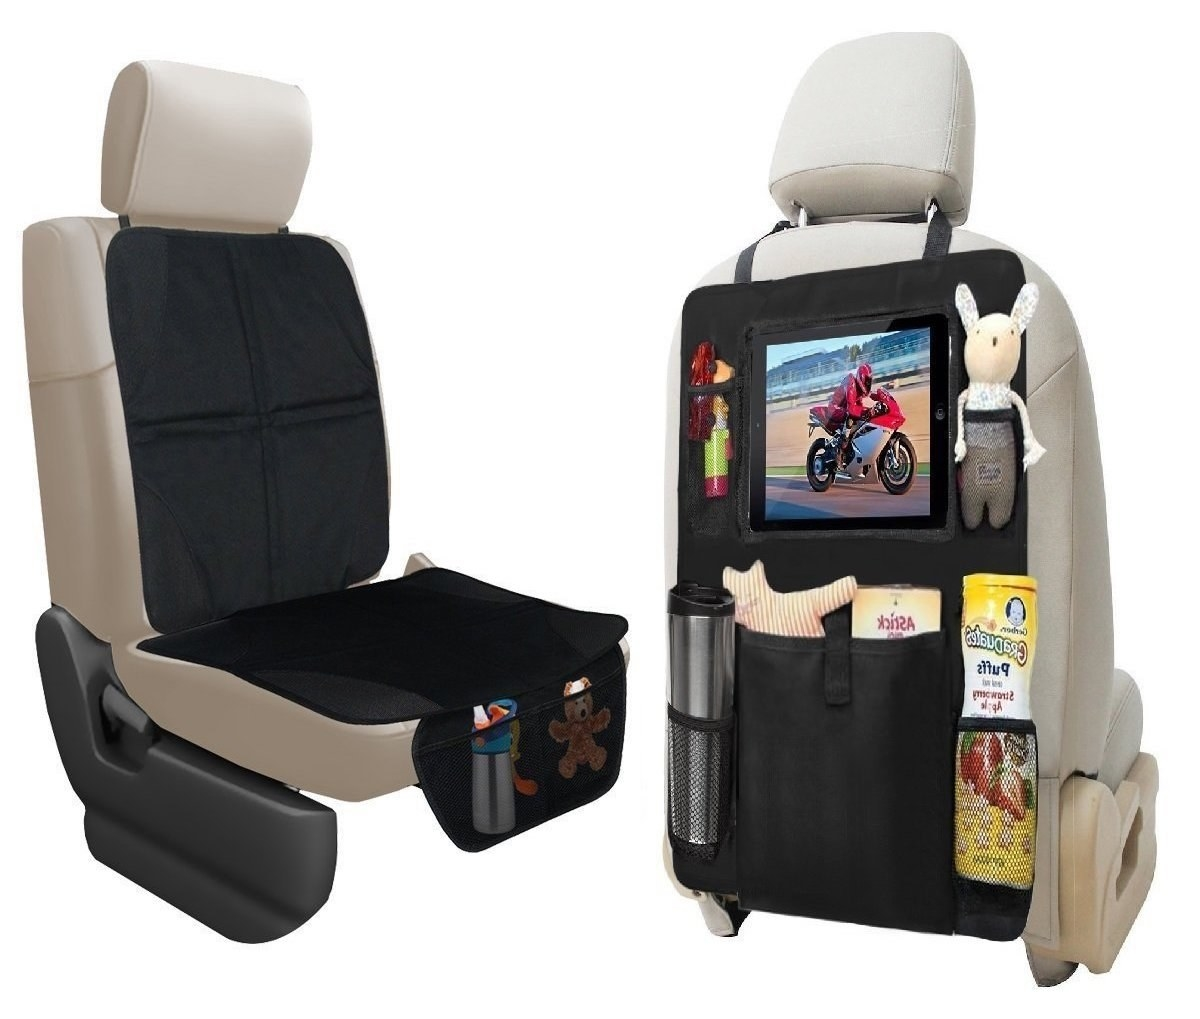 the backseat organizer showing multiple storage pockets